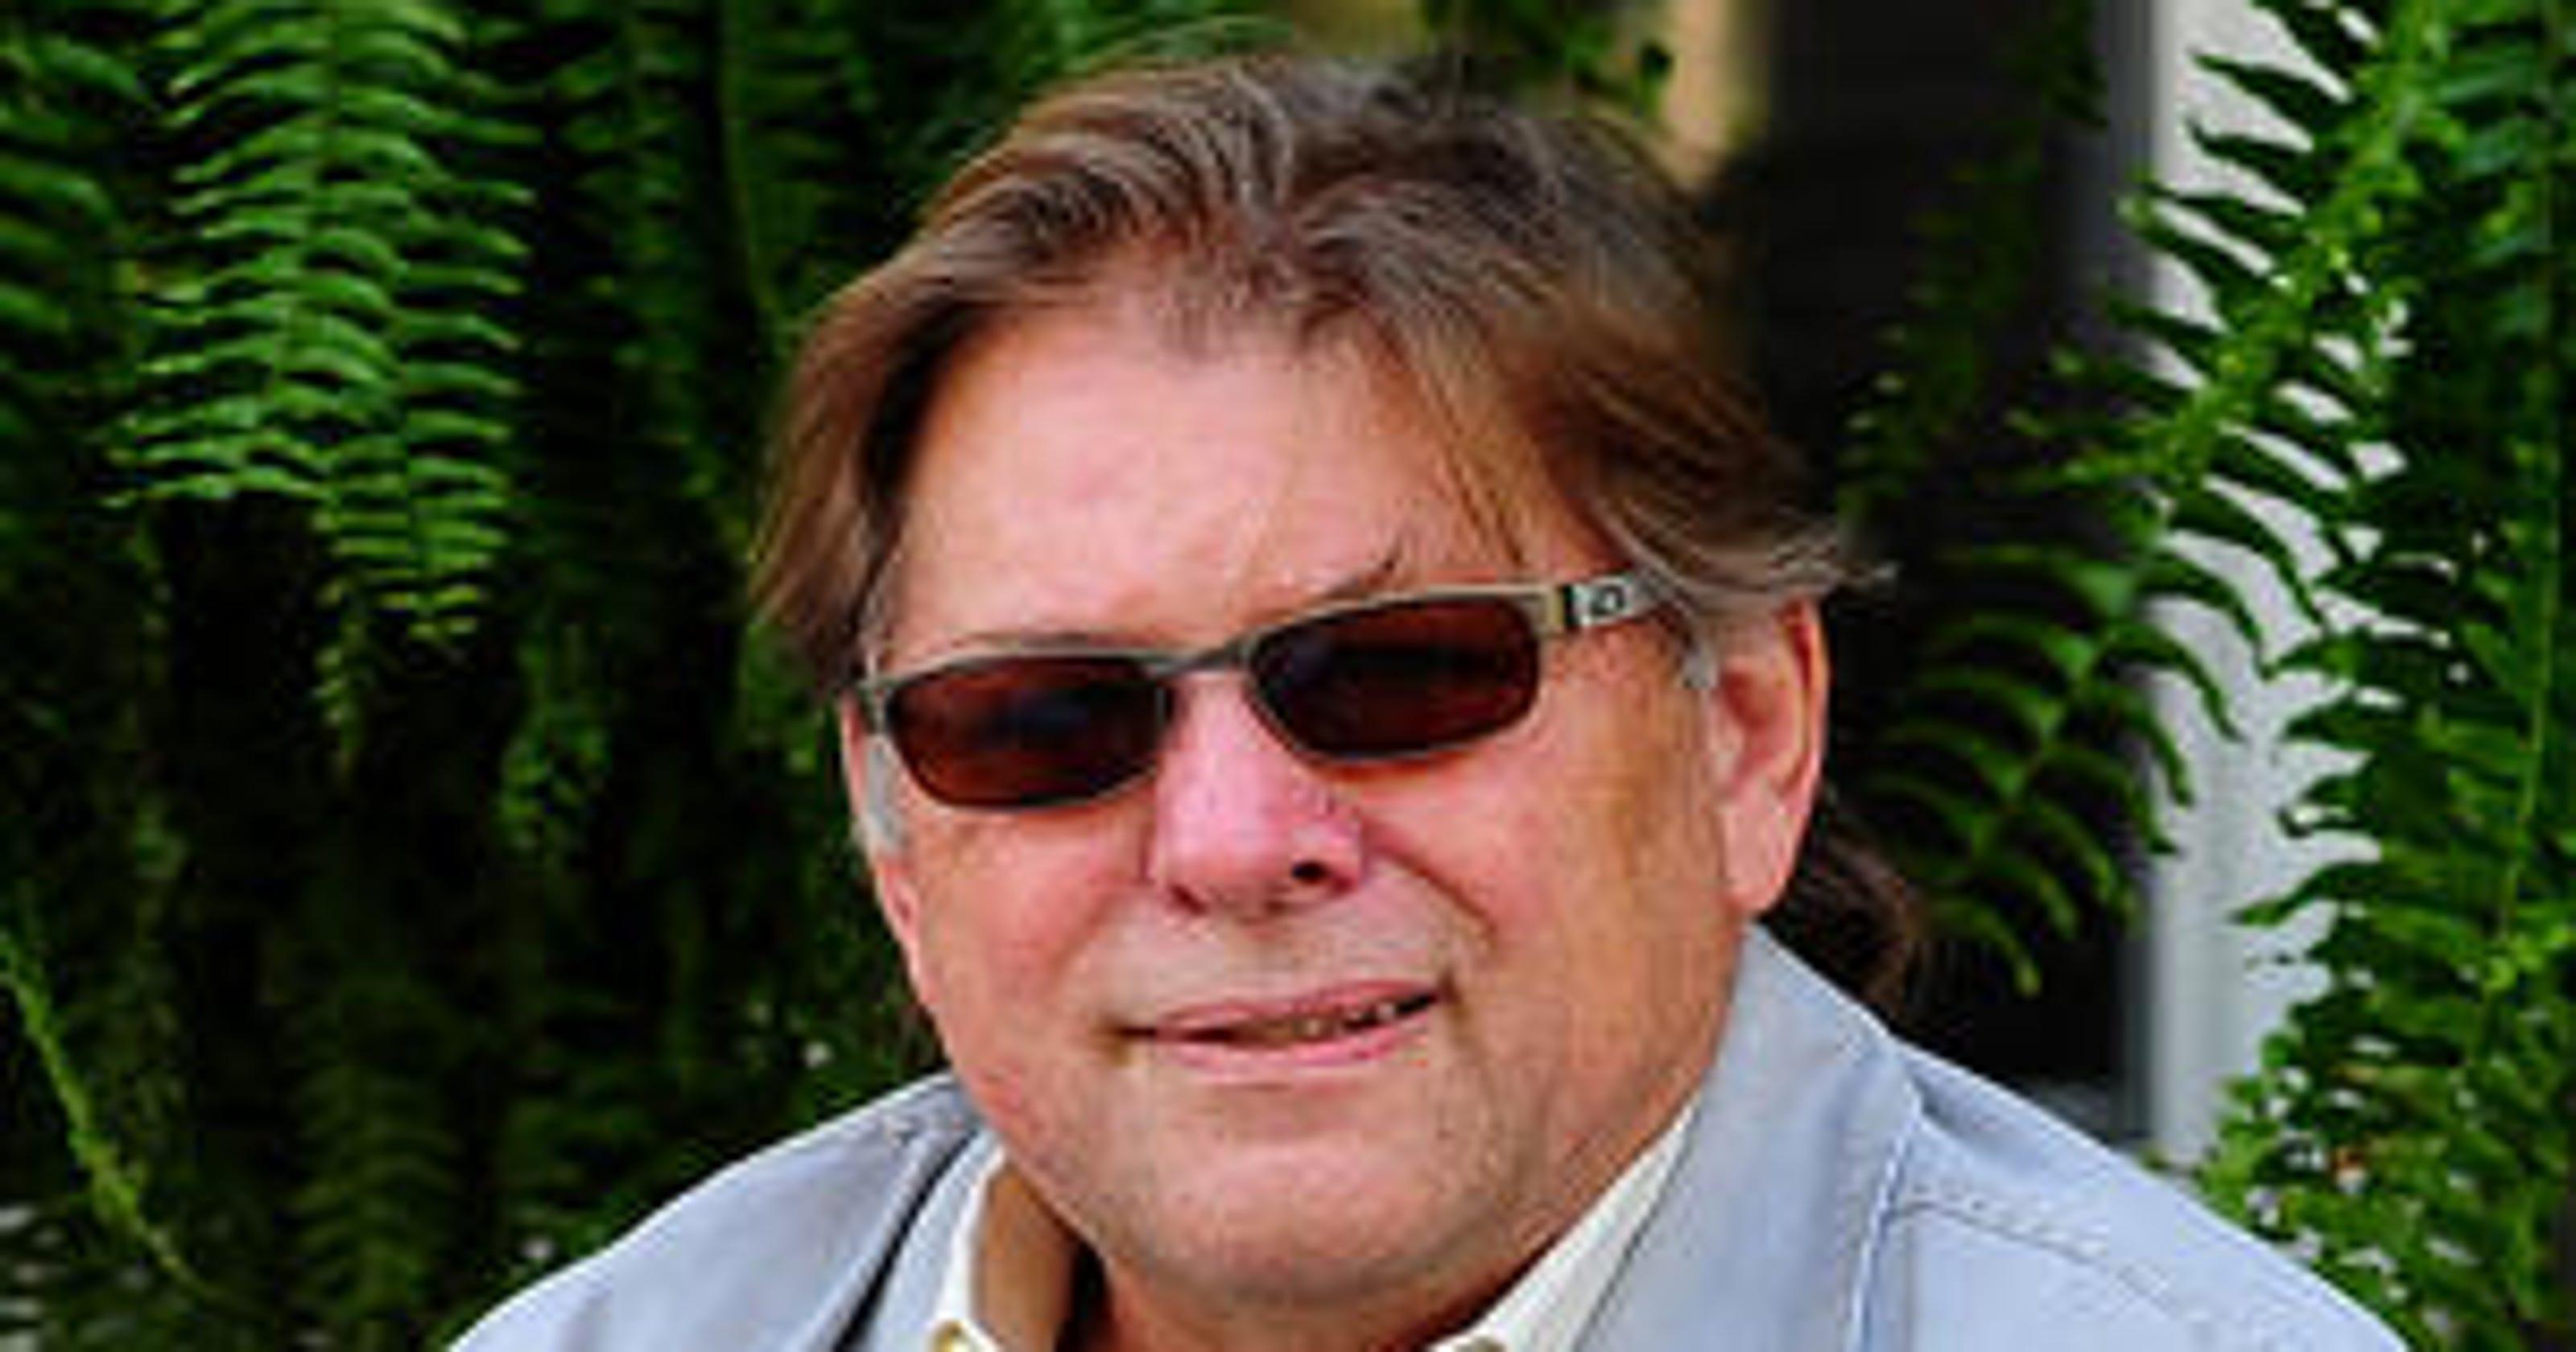 Robert Williamson pleads guilty in bribery scheme that